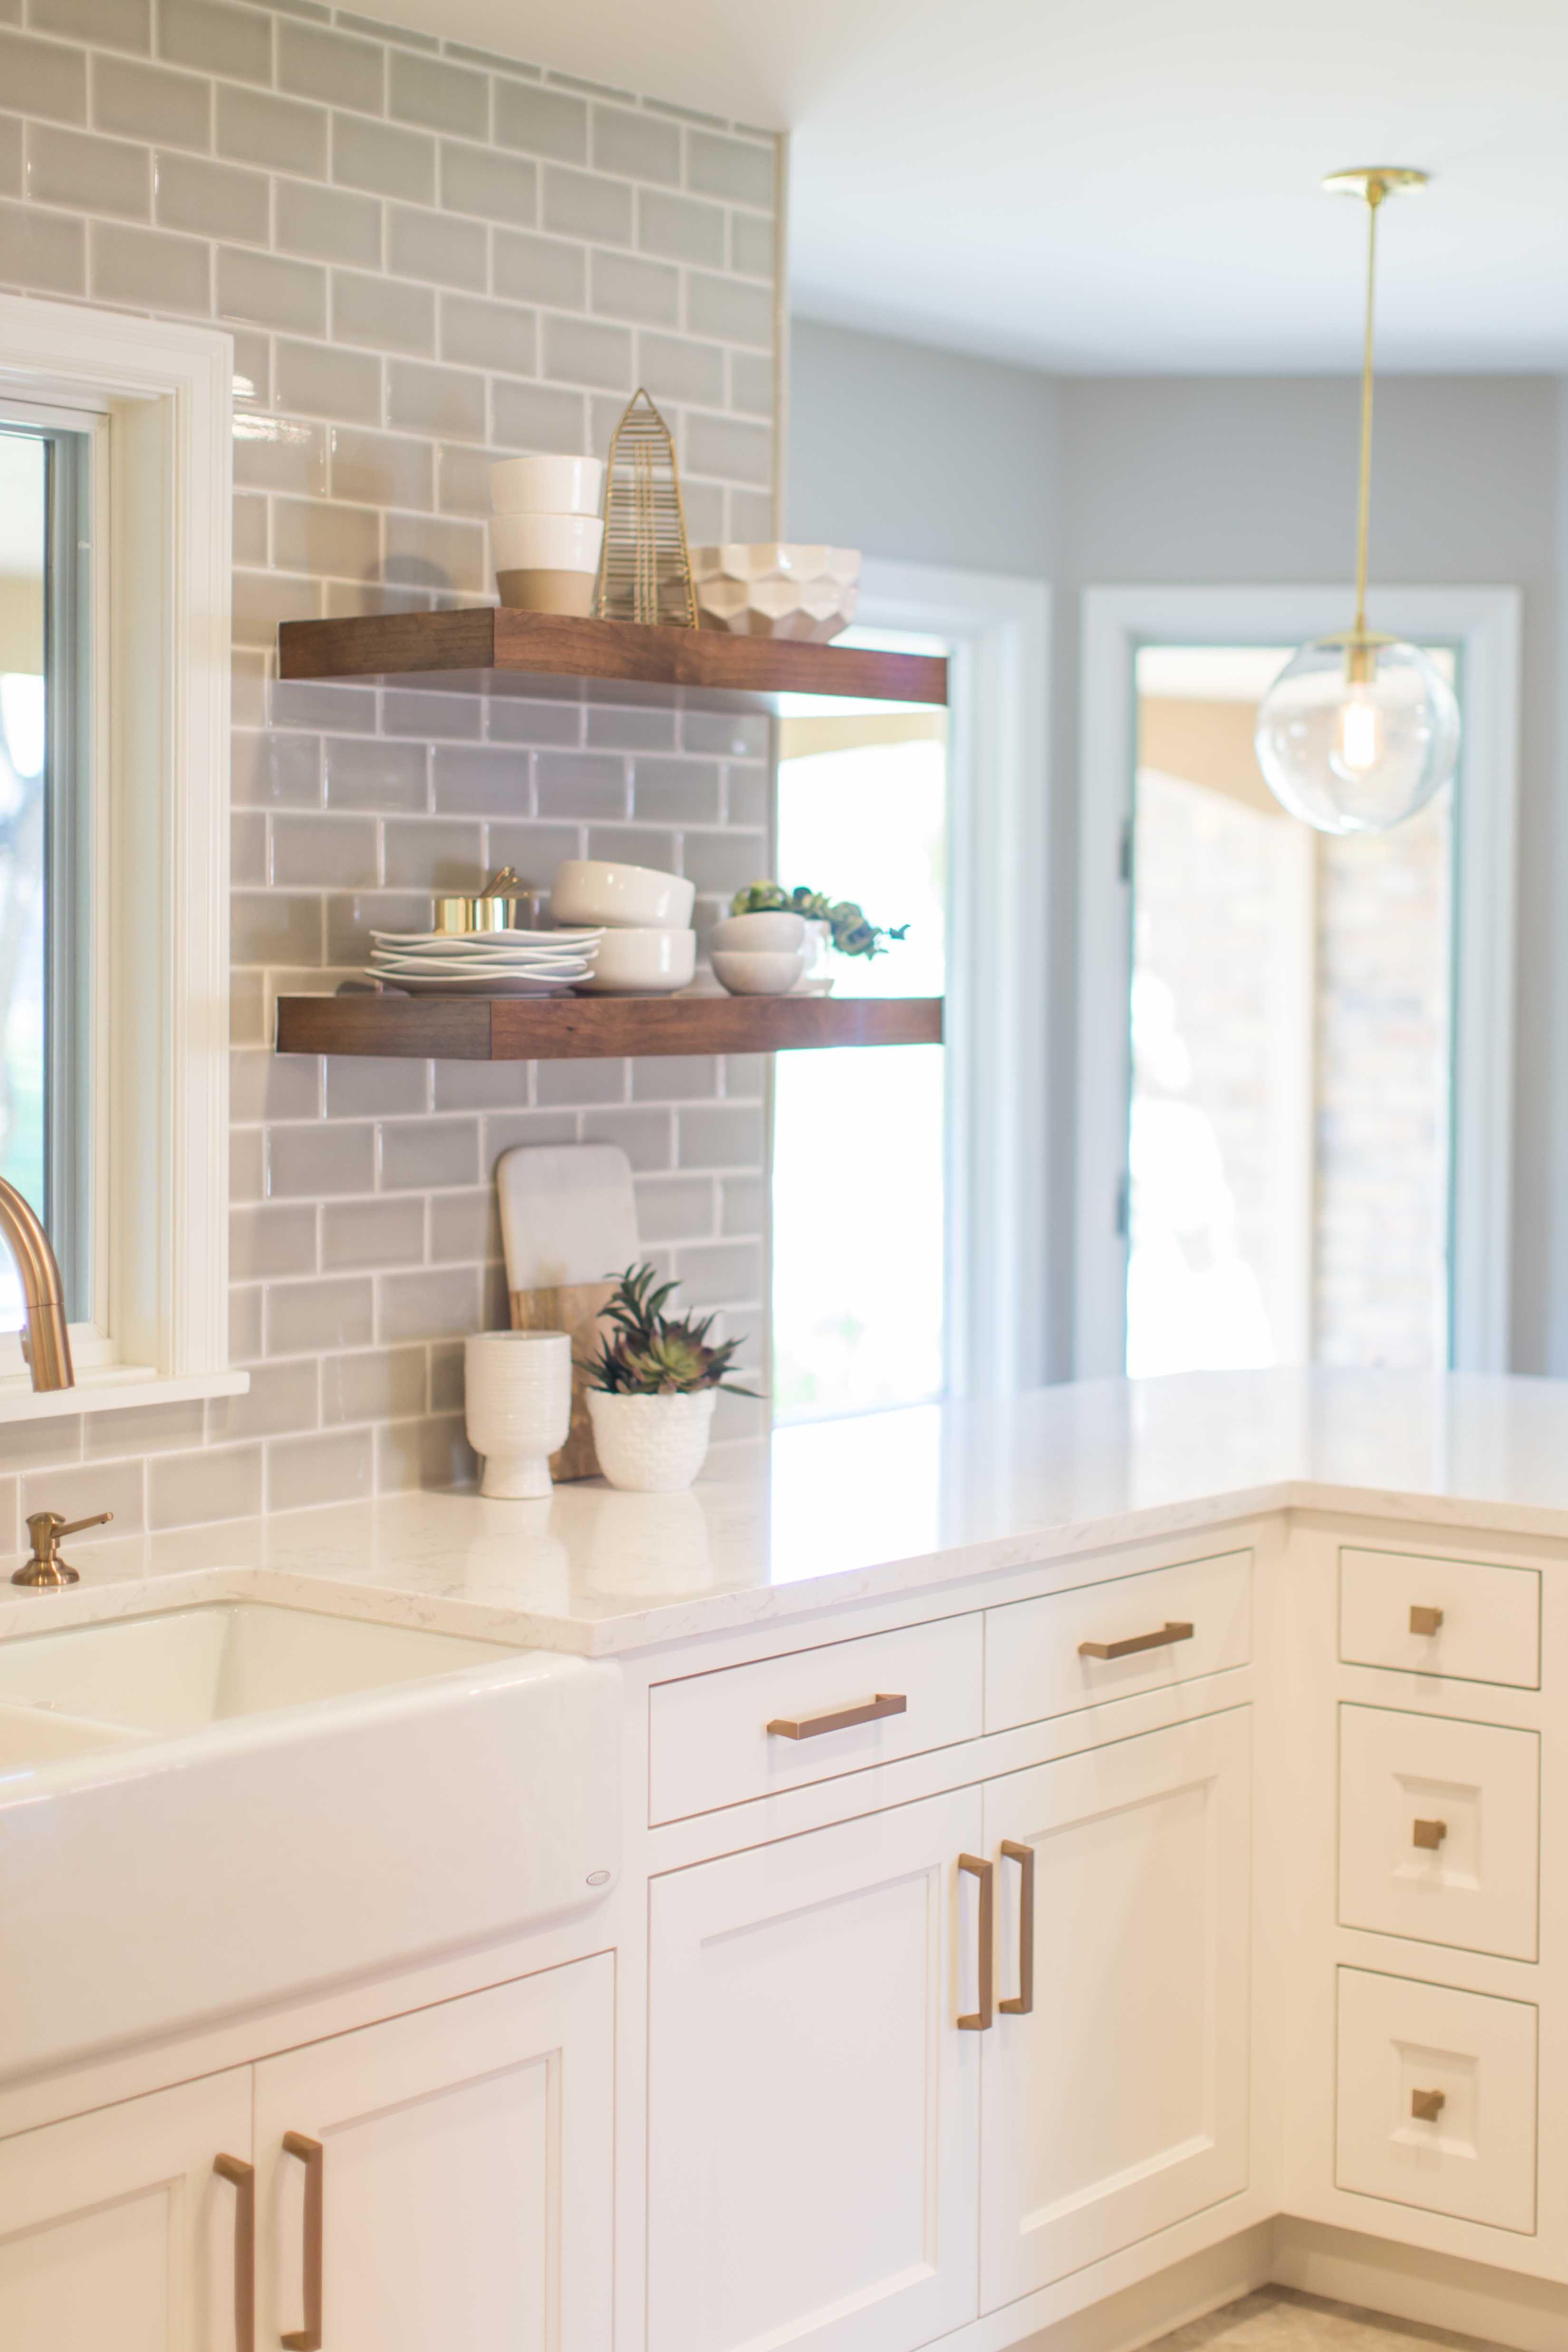 Custom Jkath Design Build Cabinetry Benjamin White Dove Paint Berenson Gold Hardware Cambria Torquay Kitchen Renovation Home Kitchens Kitchen Design